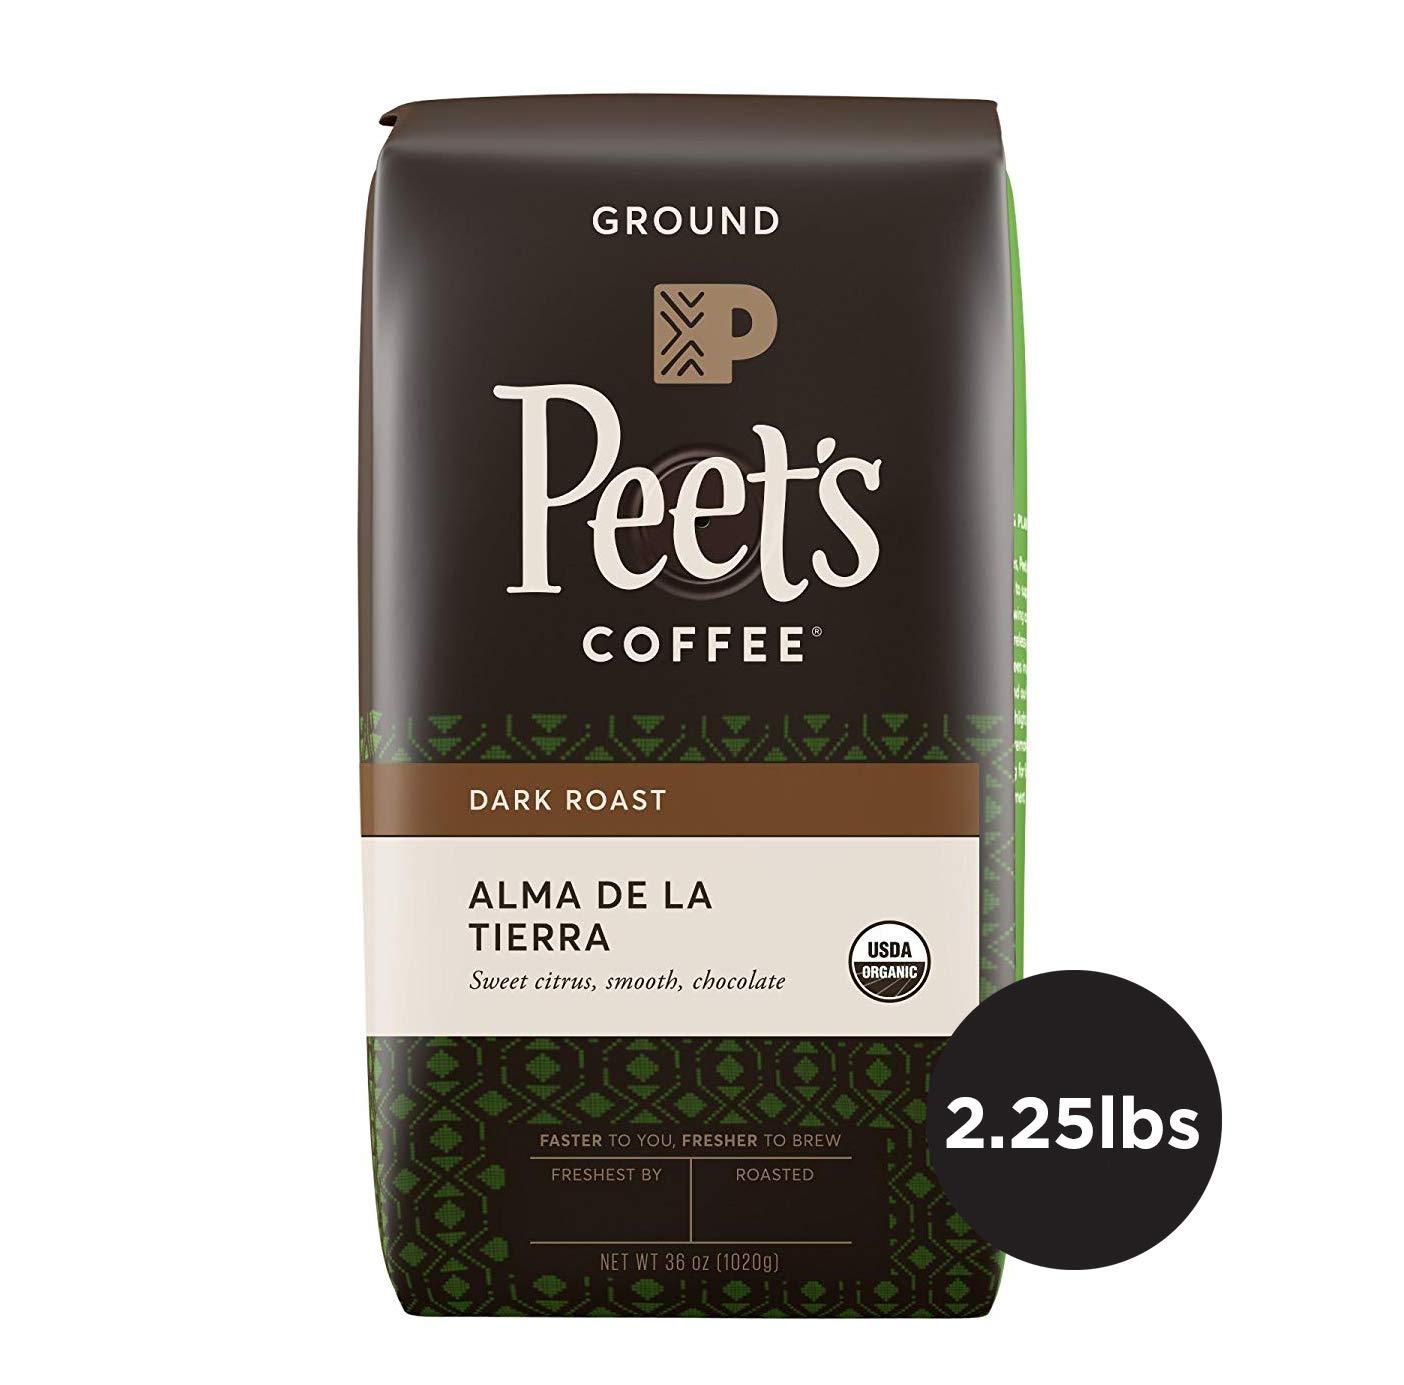 Peet's Coffee Alma de la Tierra Dark Roast Ground Coffee Organic, 2.25 Pound Bag USDA Organic by Peet's Coffee (Image #1)